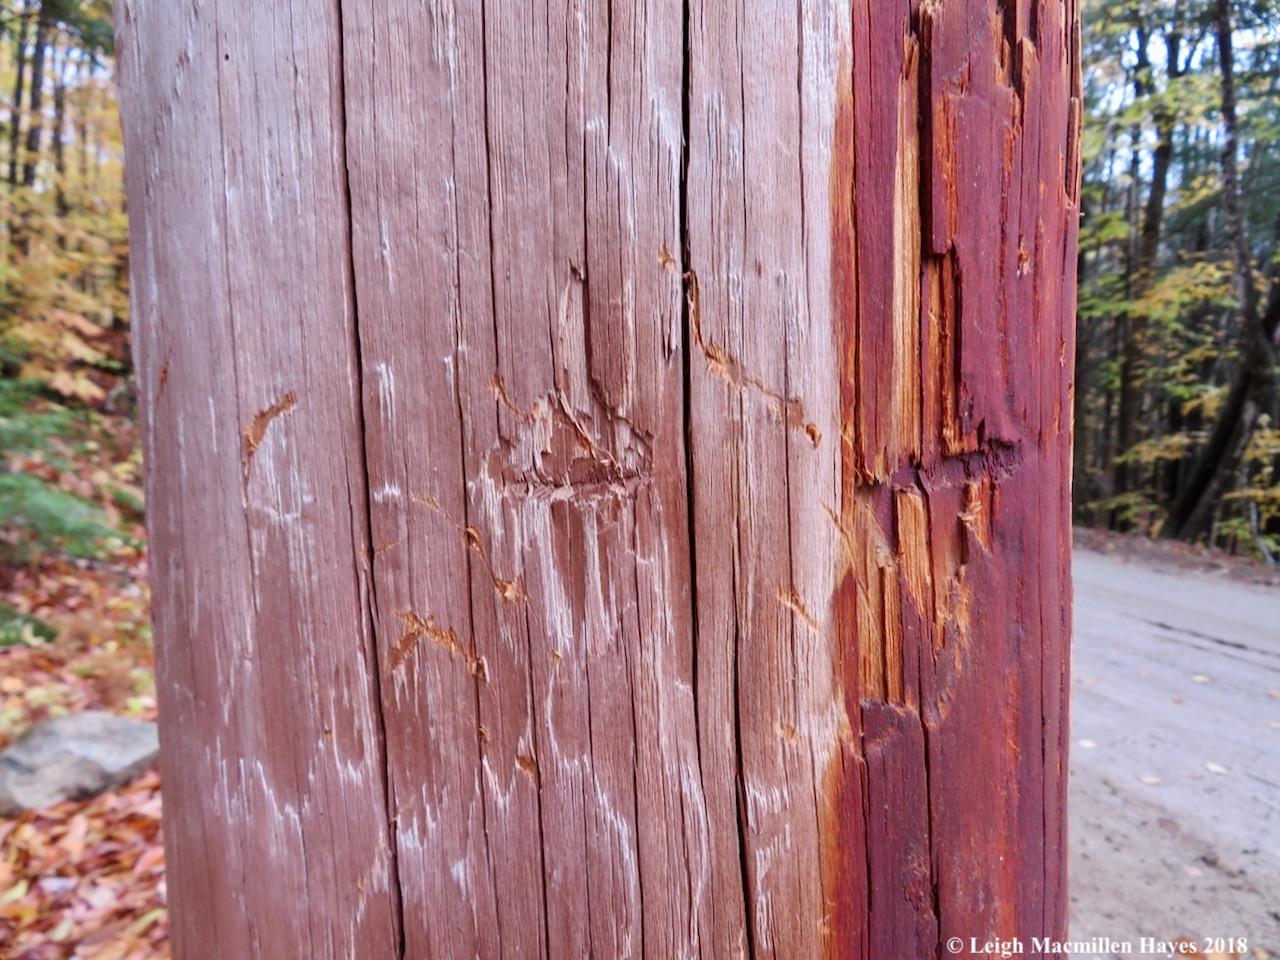 5-scratches on bear poles